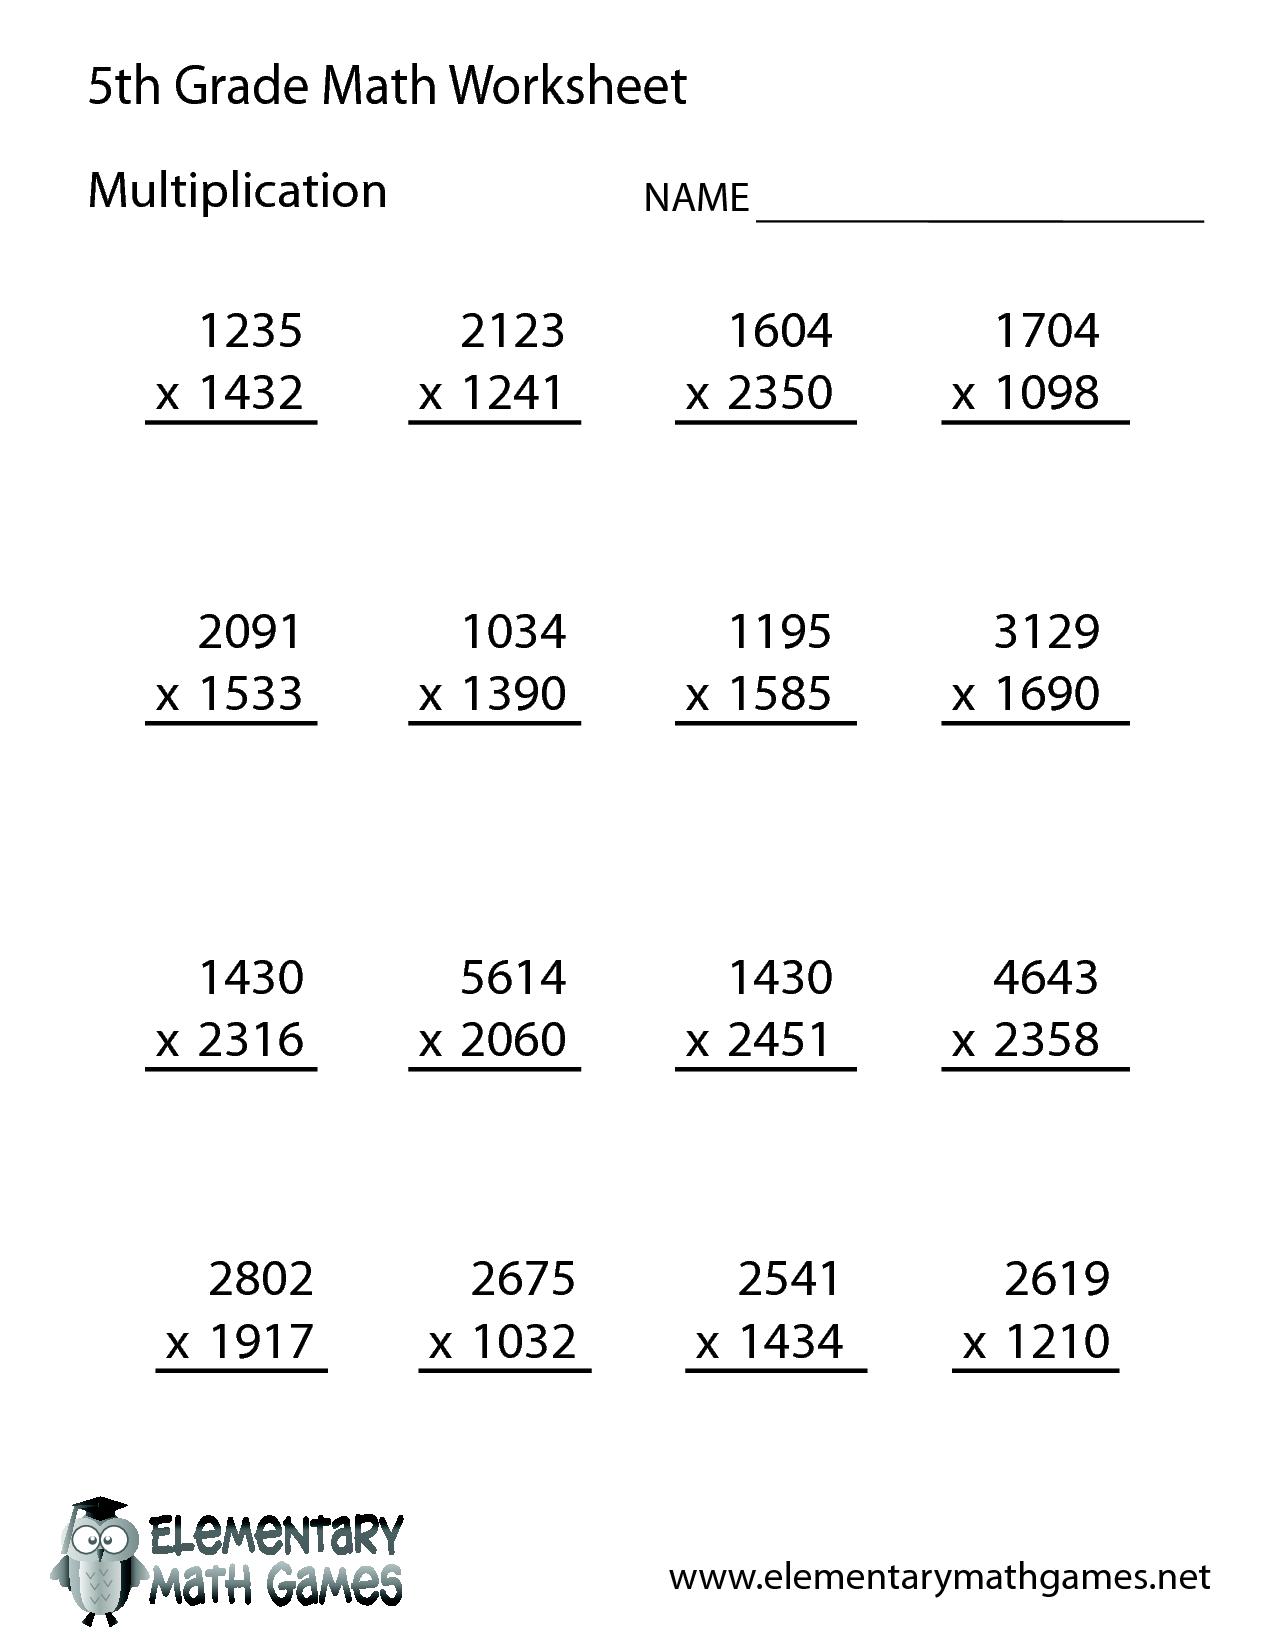 Free Math Worksheets for 5th Grade | 5th Grade Math ...